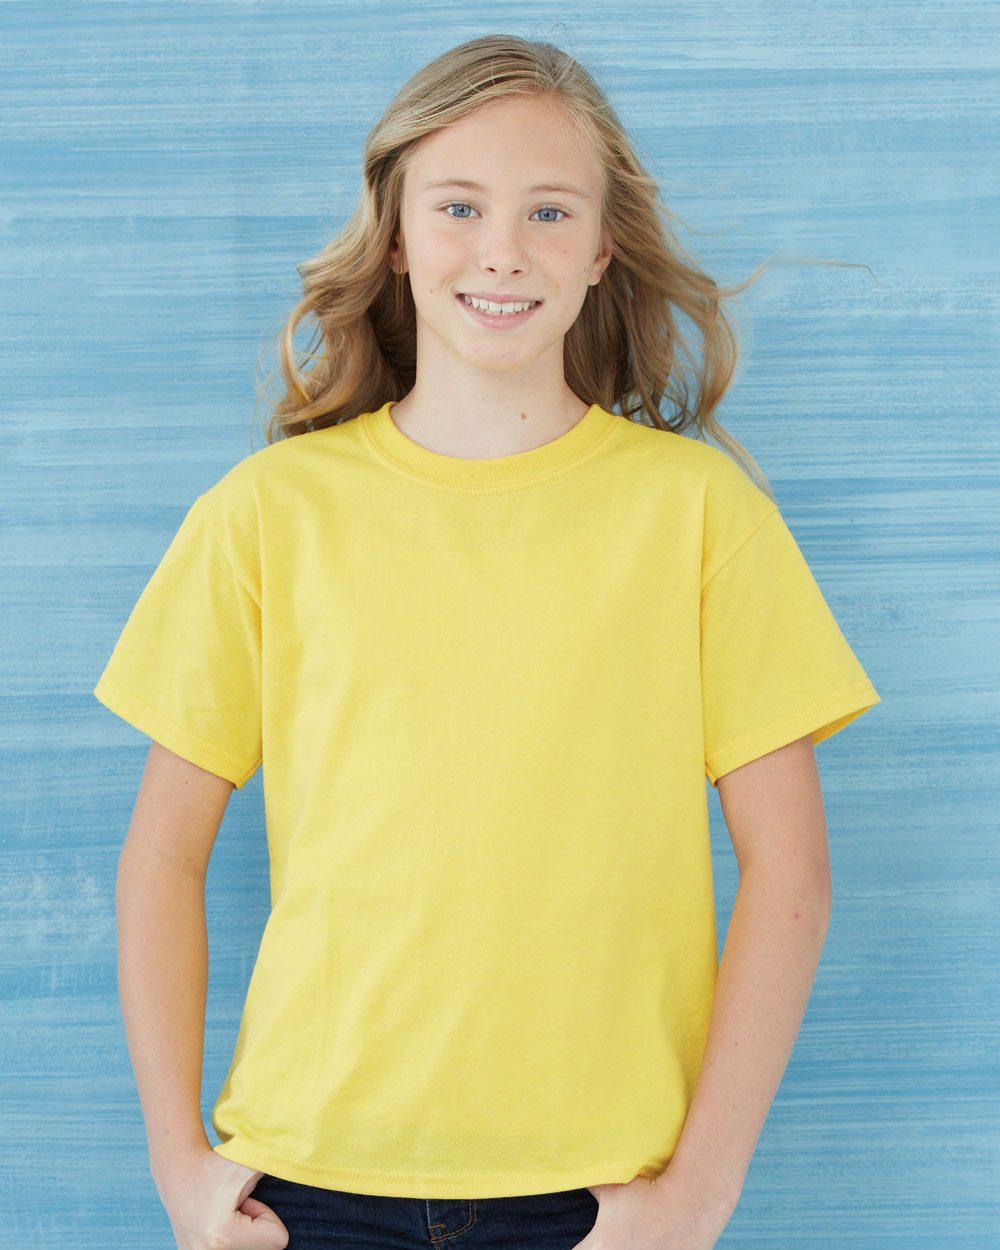 Gildan 8000B - Youth DryBlend T-Shirt